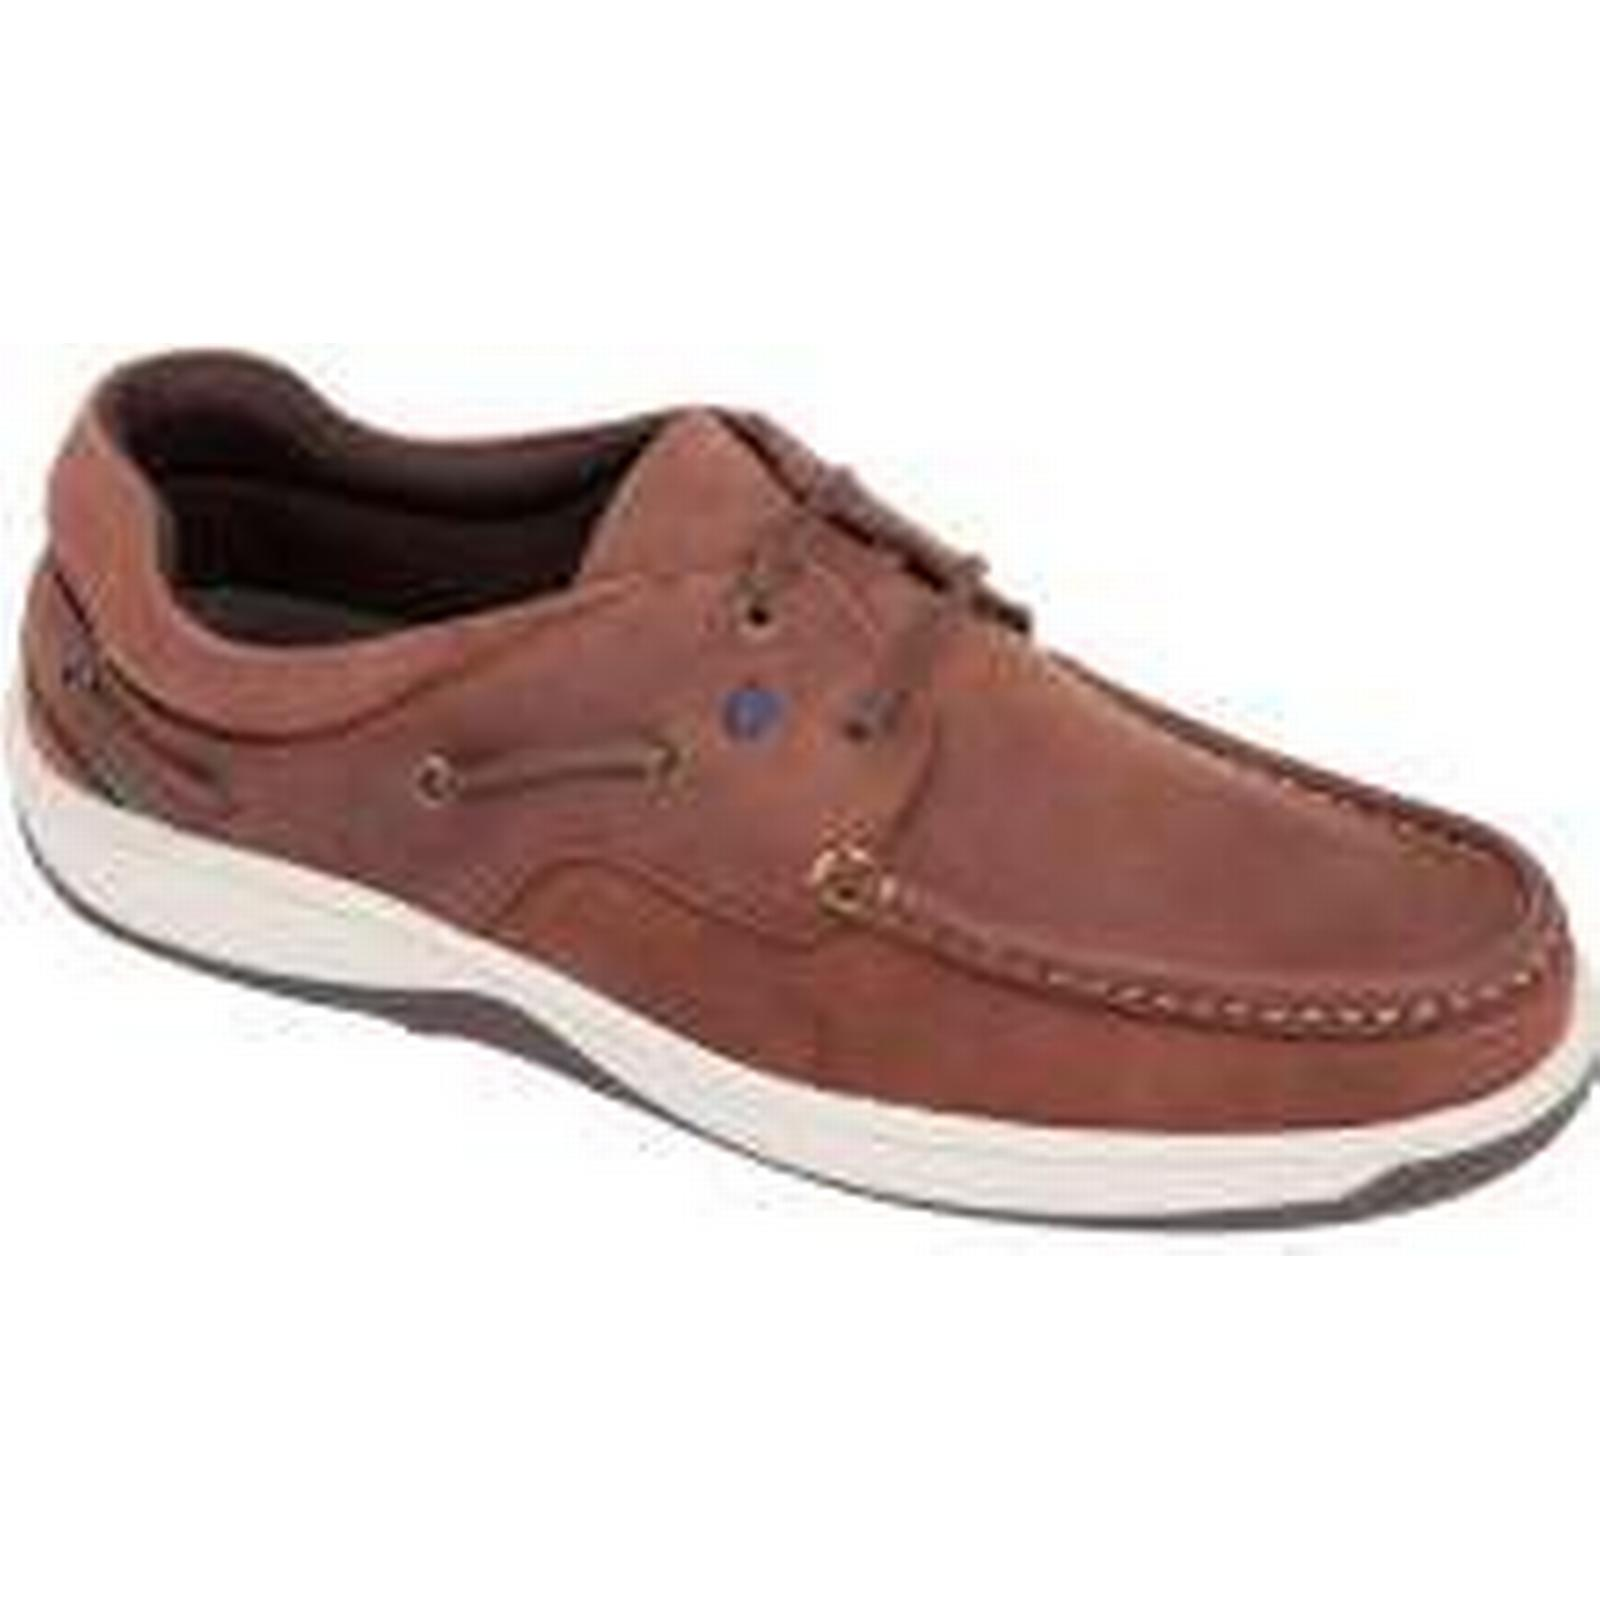 Dubarry UK9 Navigator Deck Shoes, Chestnut, UK9 Dubarry 088be0